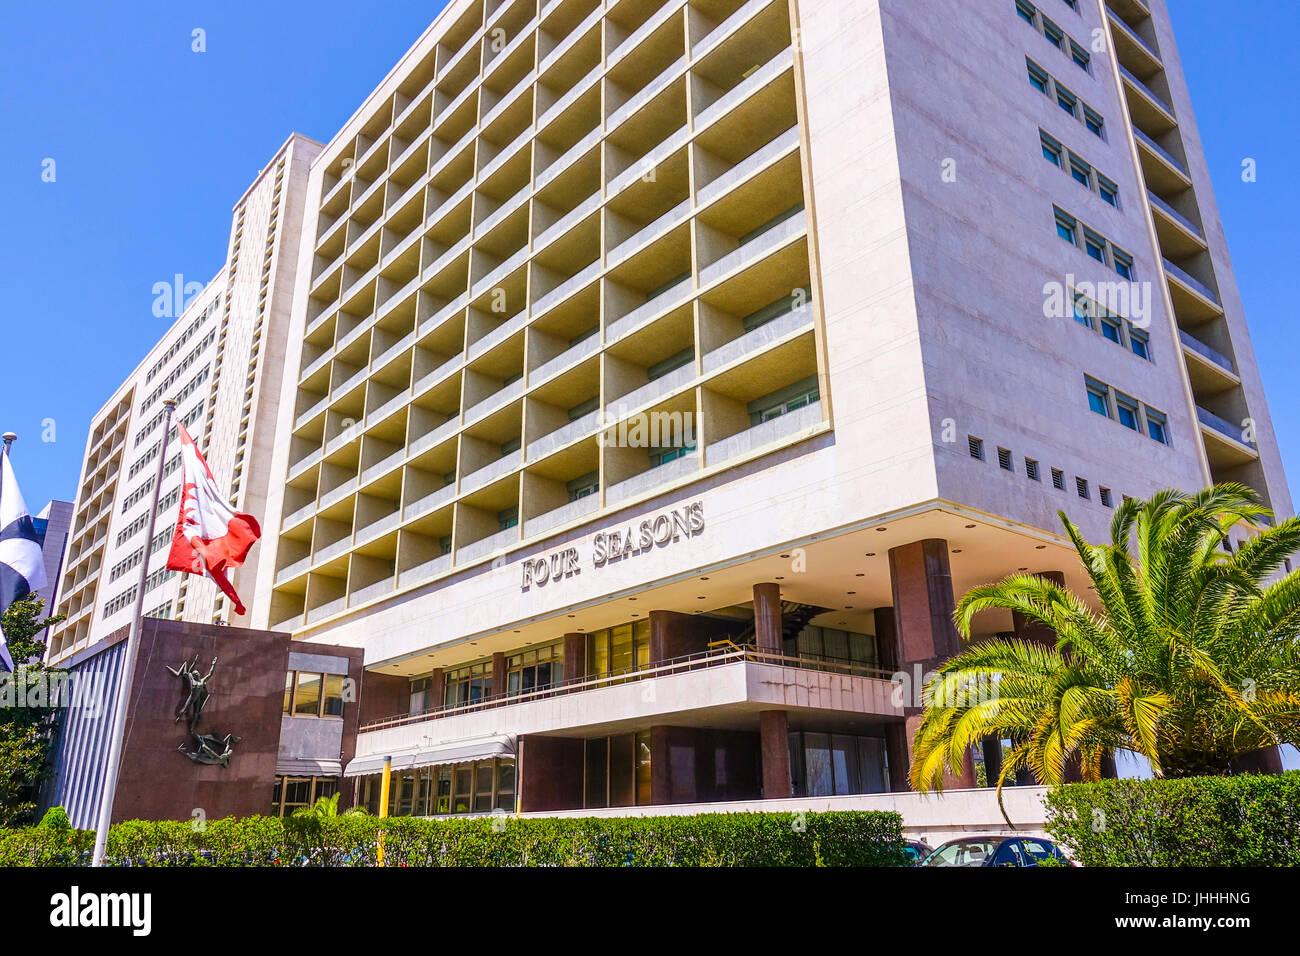 The Ritz Four Seasons Hotel in Lisbon - LISBON, PORTUGAL 2017 Stock Photo